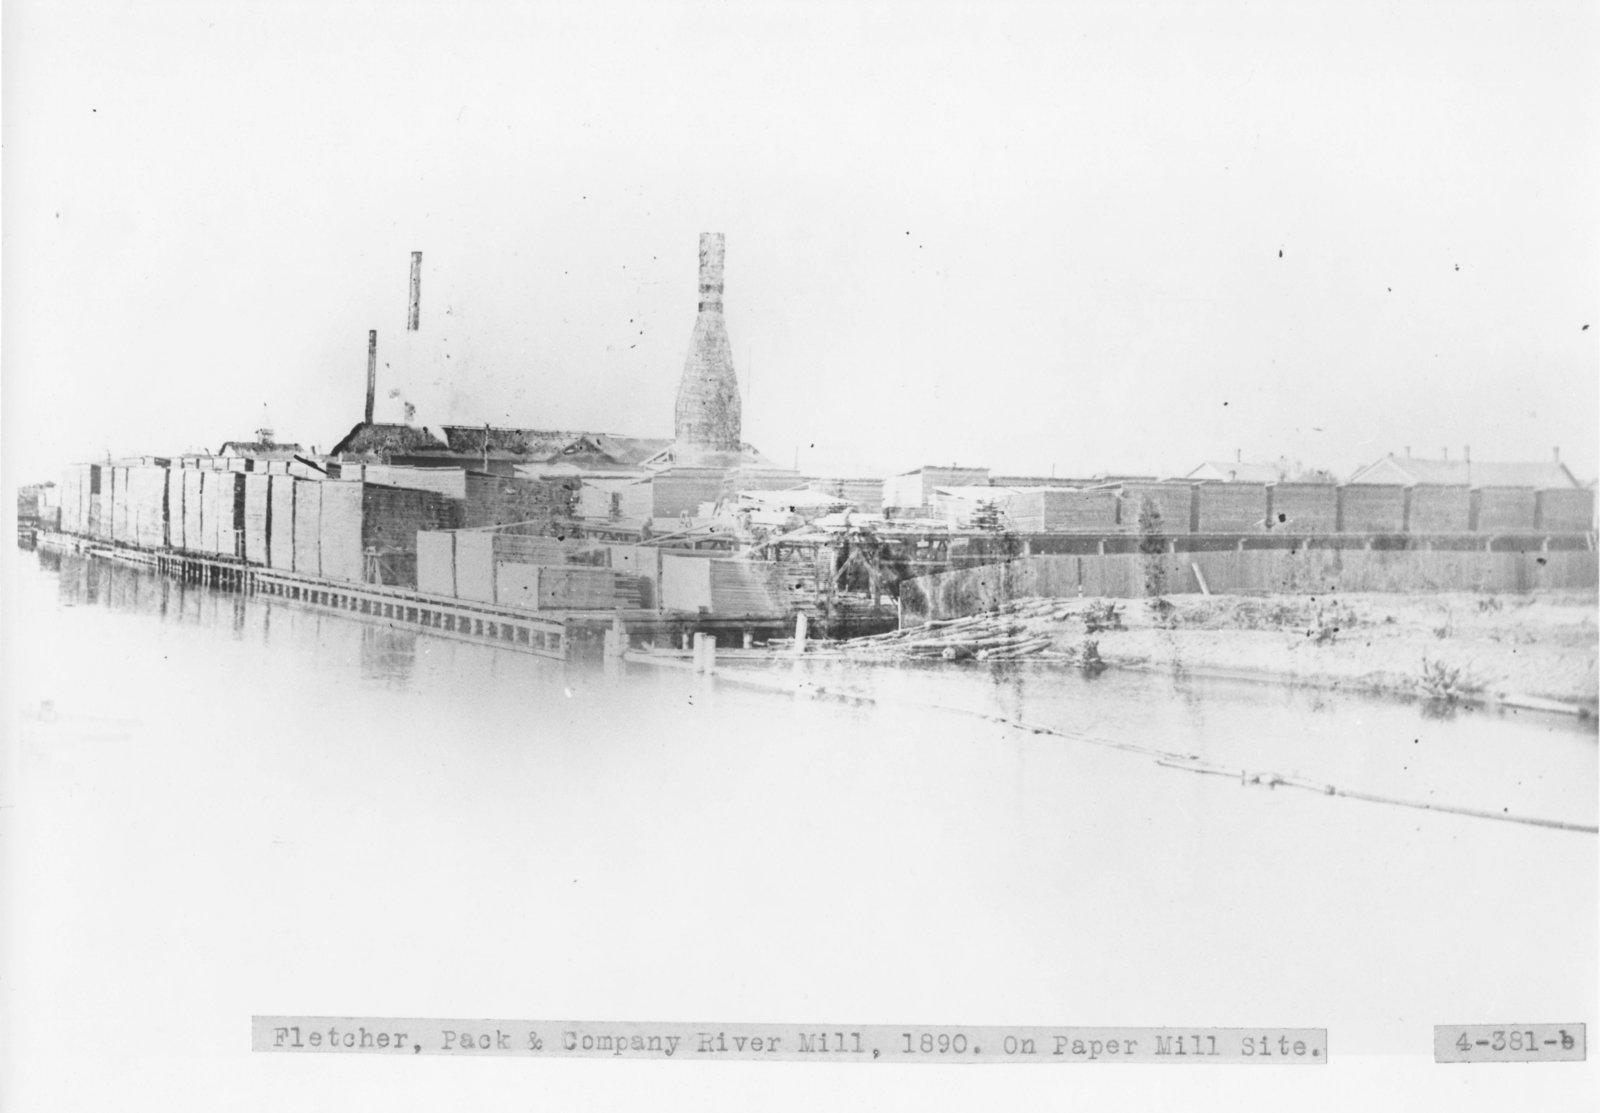 Fletcher, Pack & Company River Mill along the Thunder Bay River